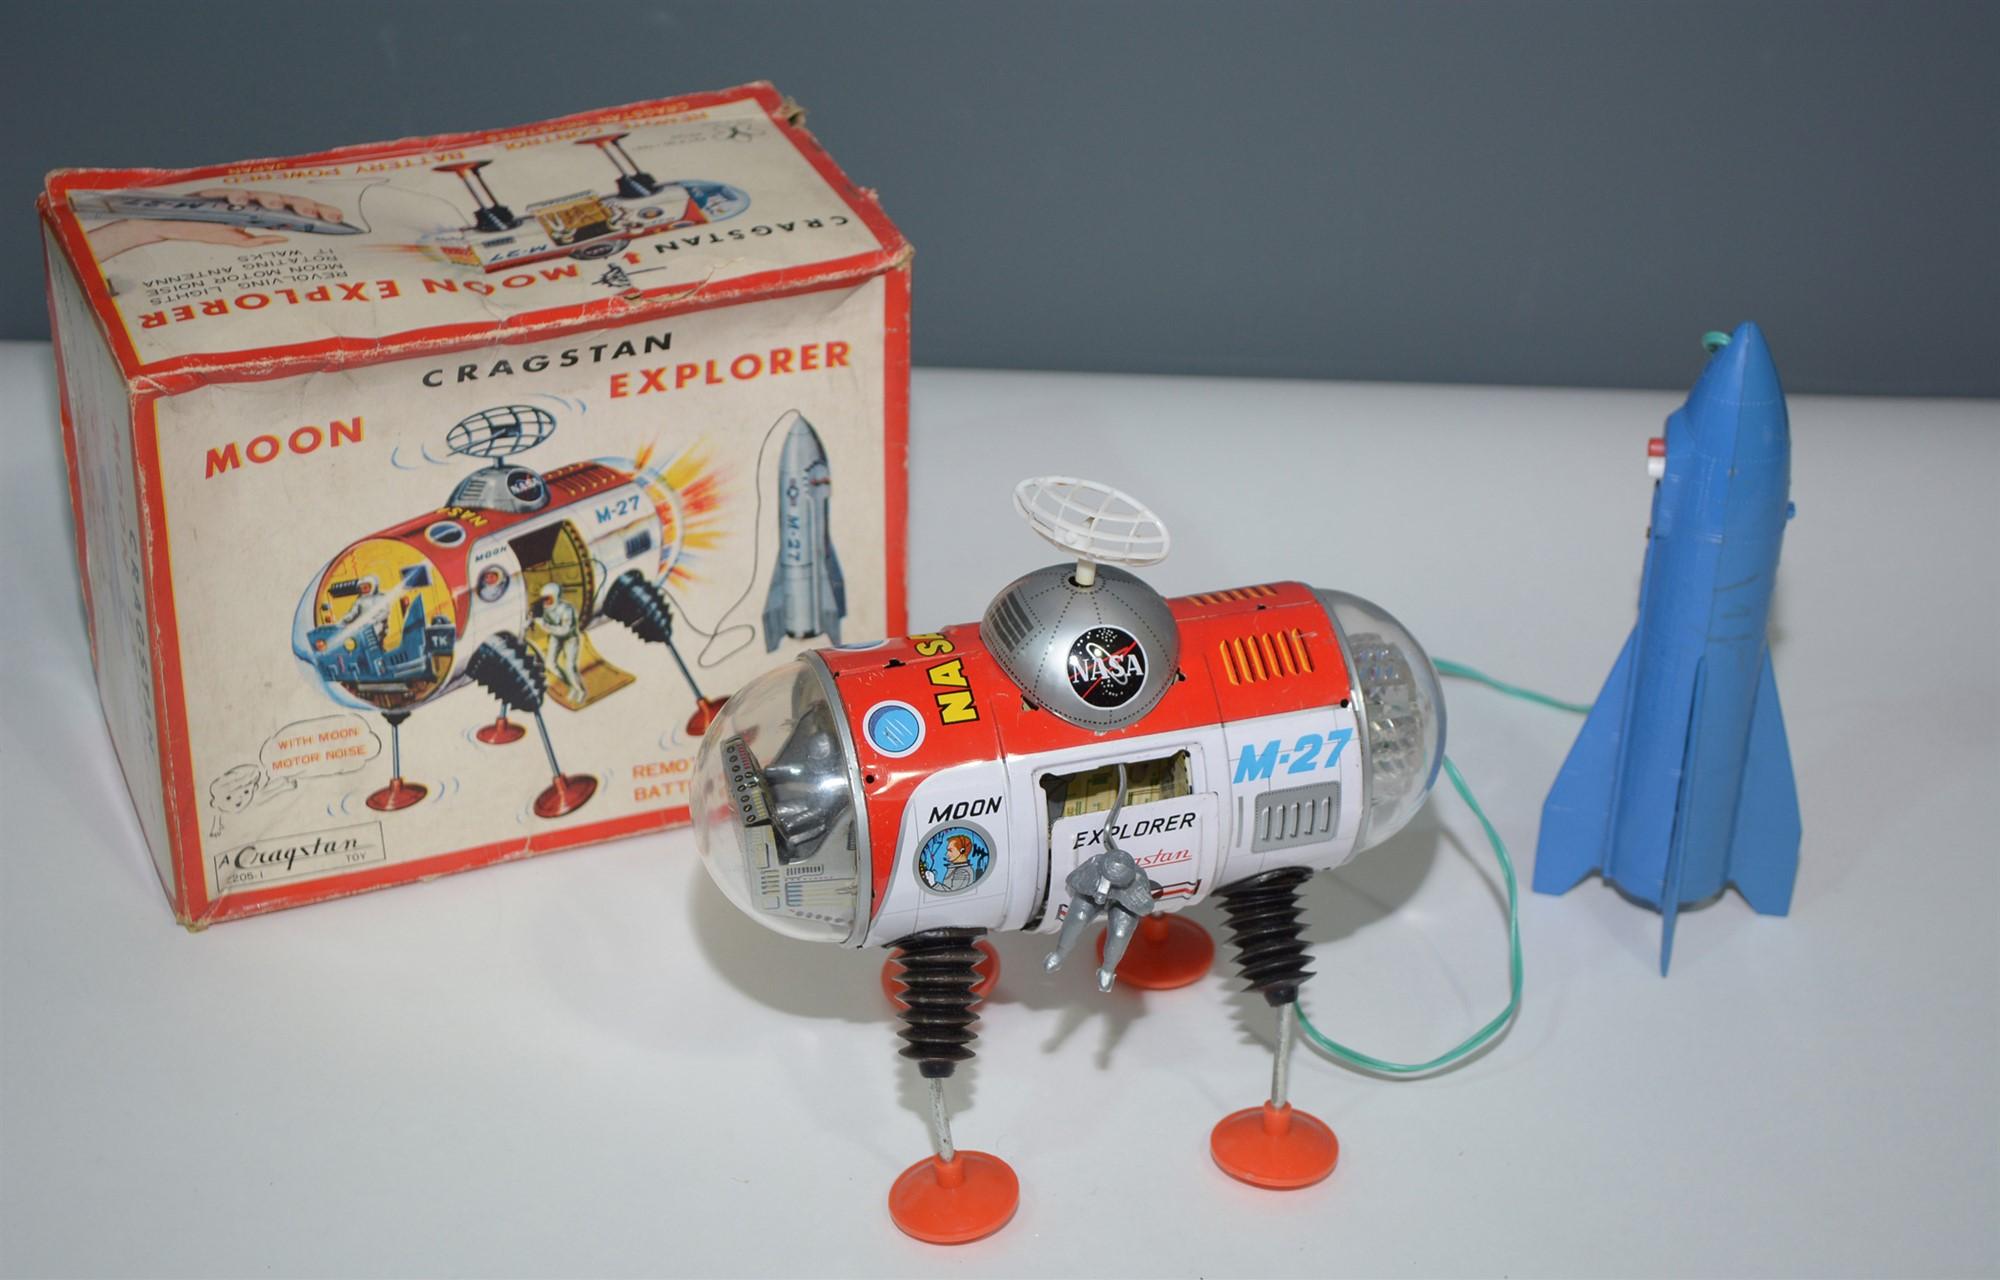 Lot 1002 - Cragston Moon Explorer